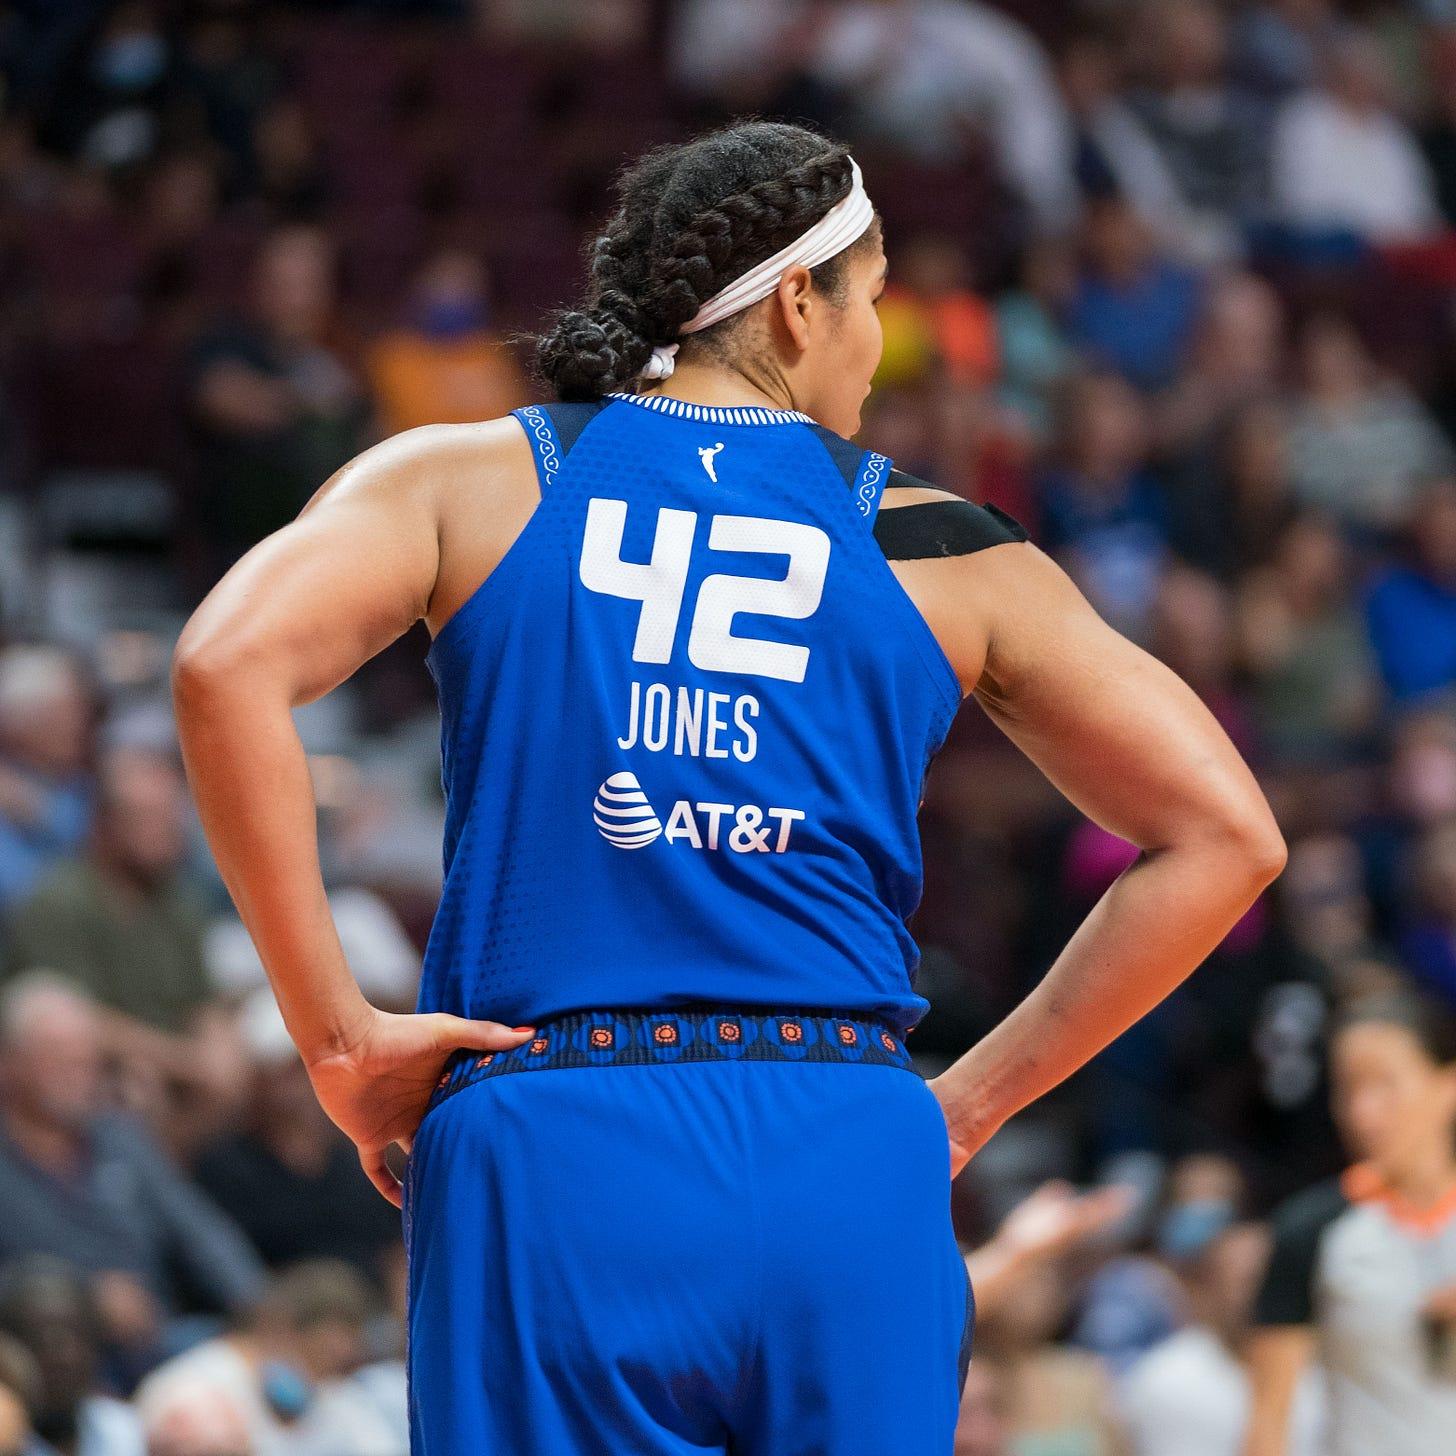 Brionna Jones of the Connecticut Sun